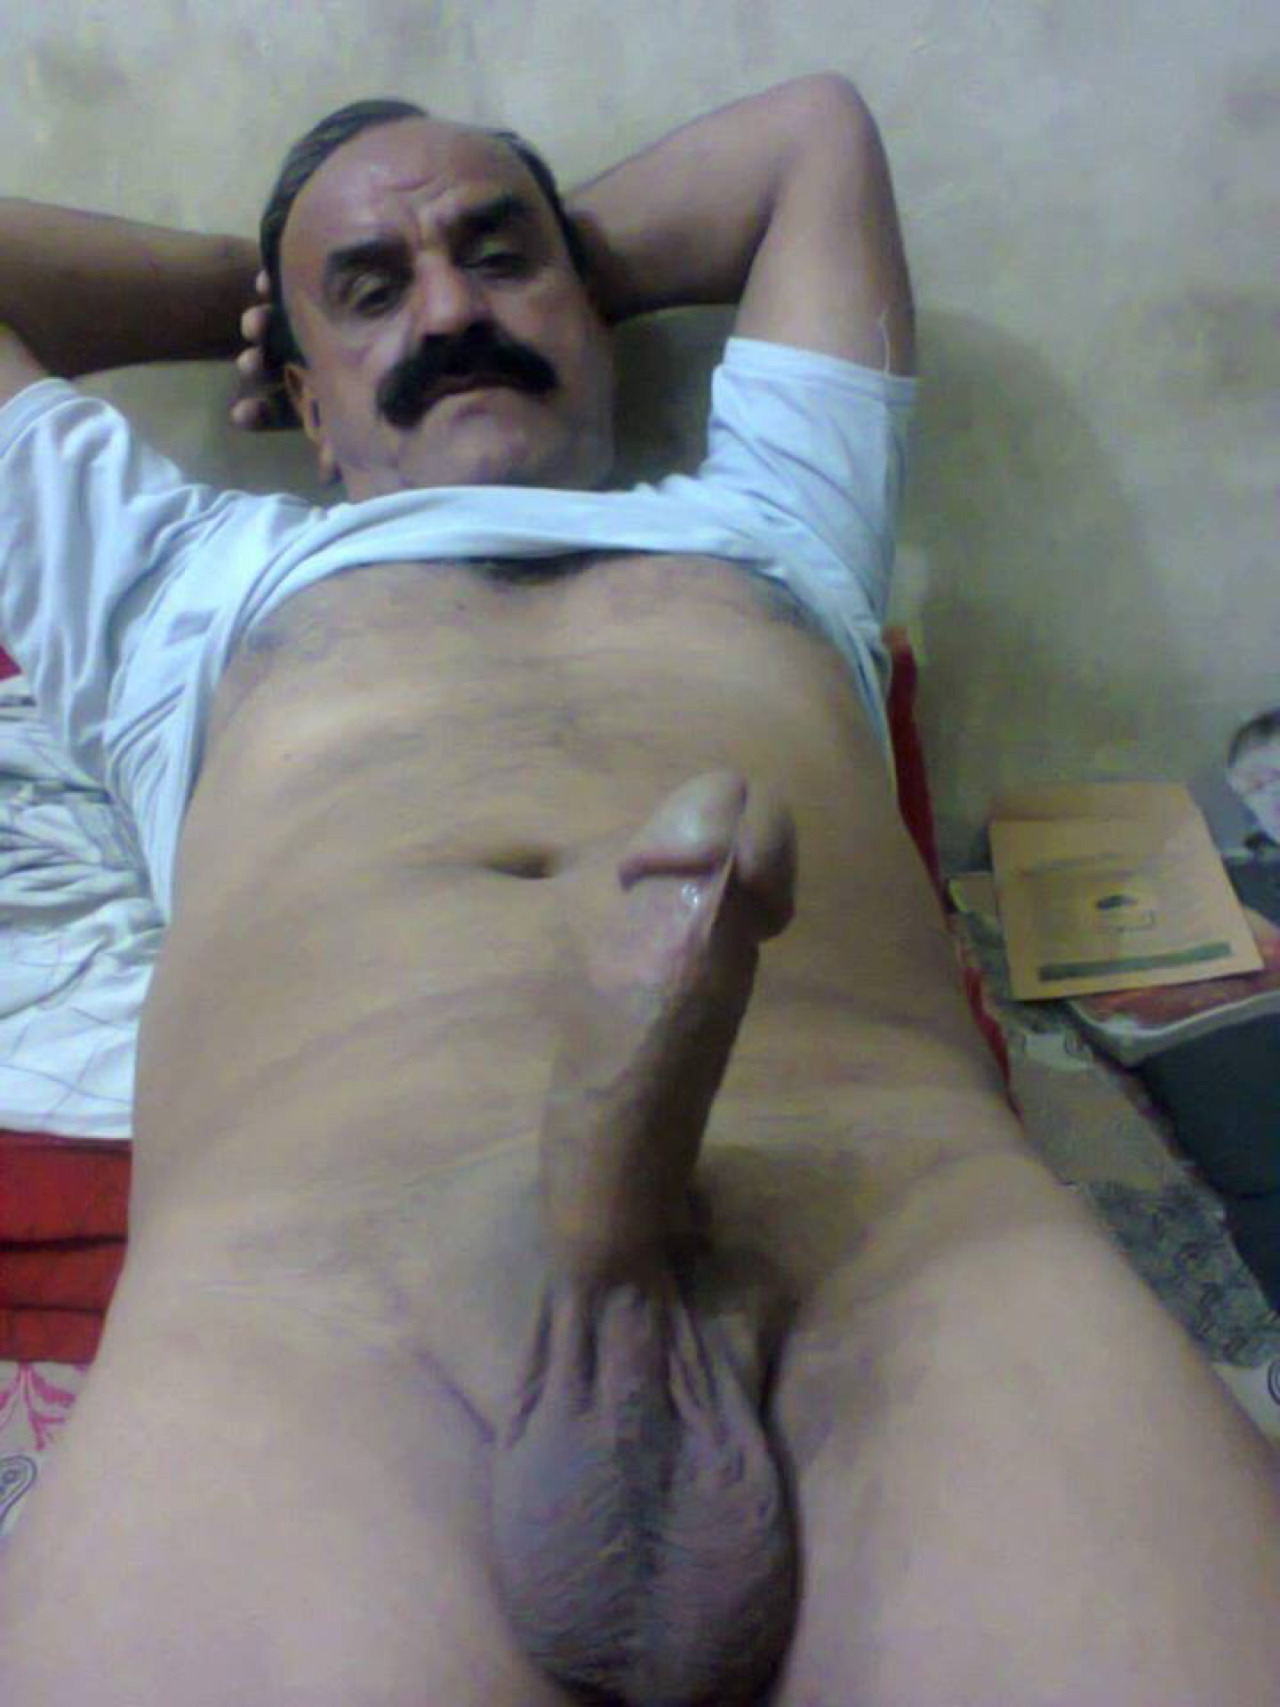 Naked sex gay porn photo of muslim boy double the fun for sebastian